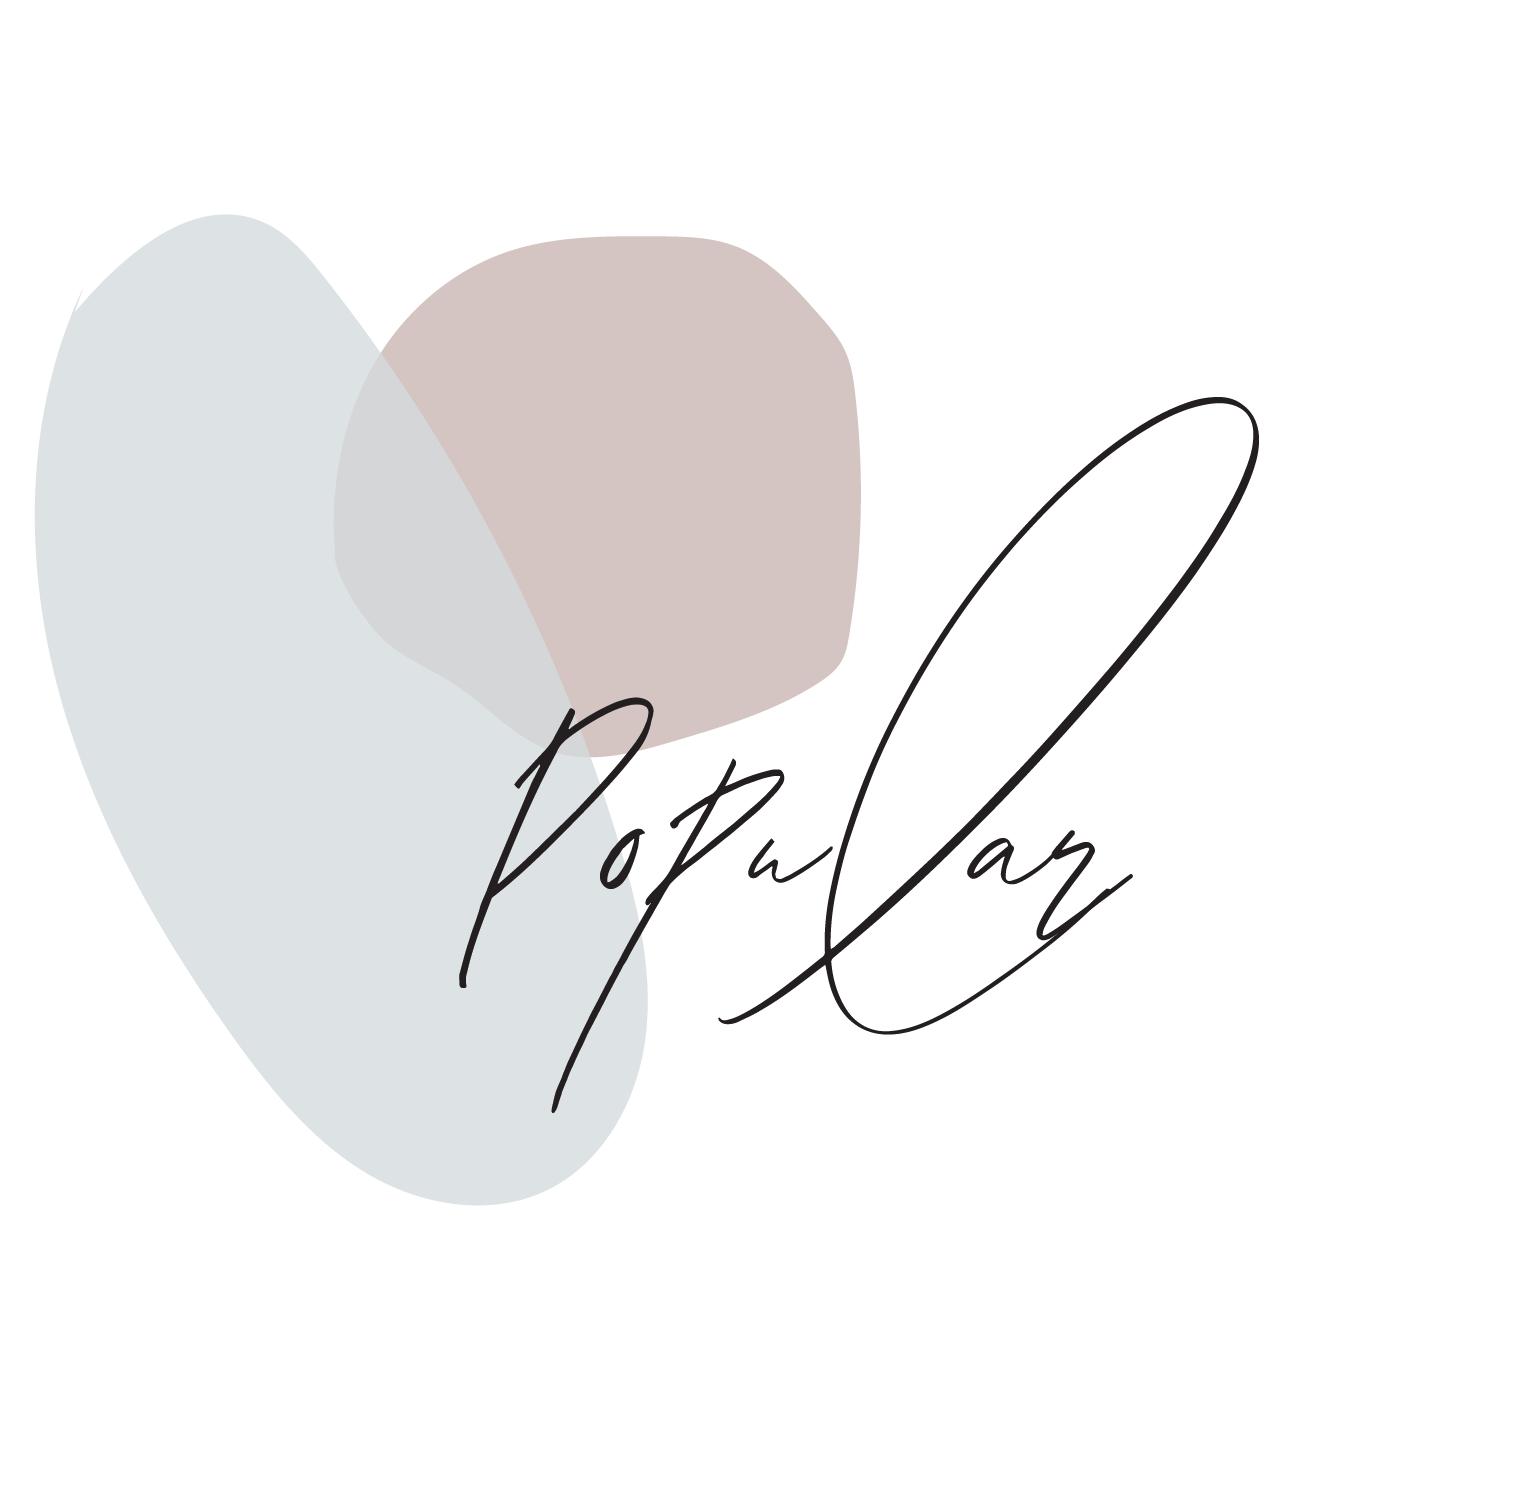 popular-branding-posts-14.png